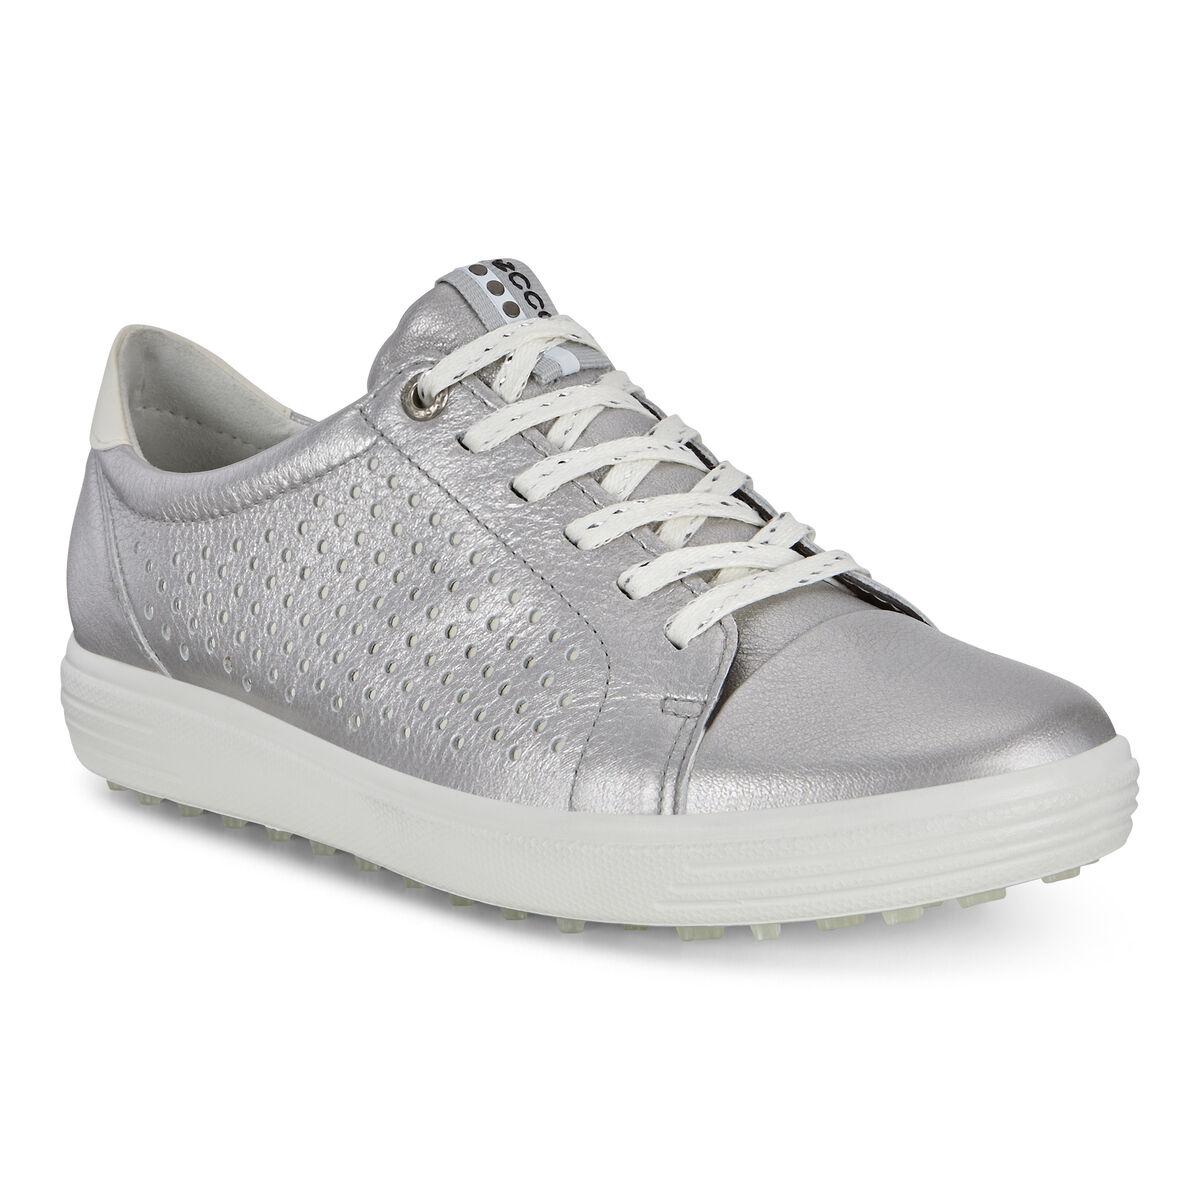 75be2958d4 ECCO Casual Hybrid Perf Women's Golf Shoe - Silver